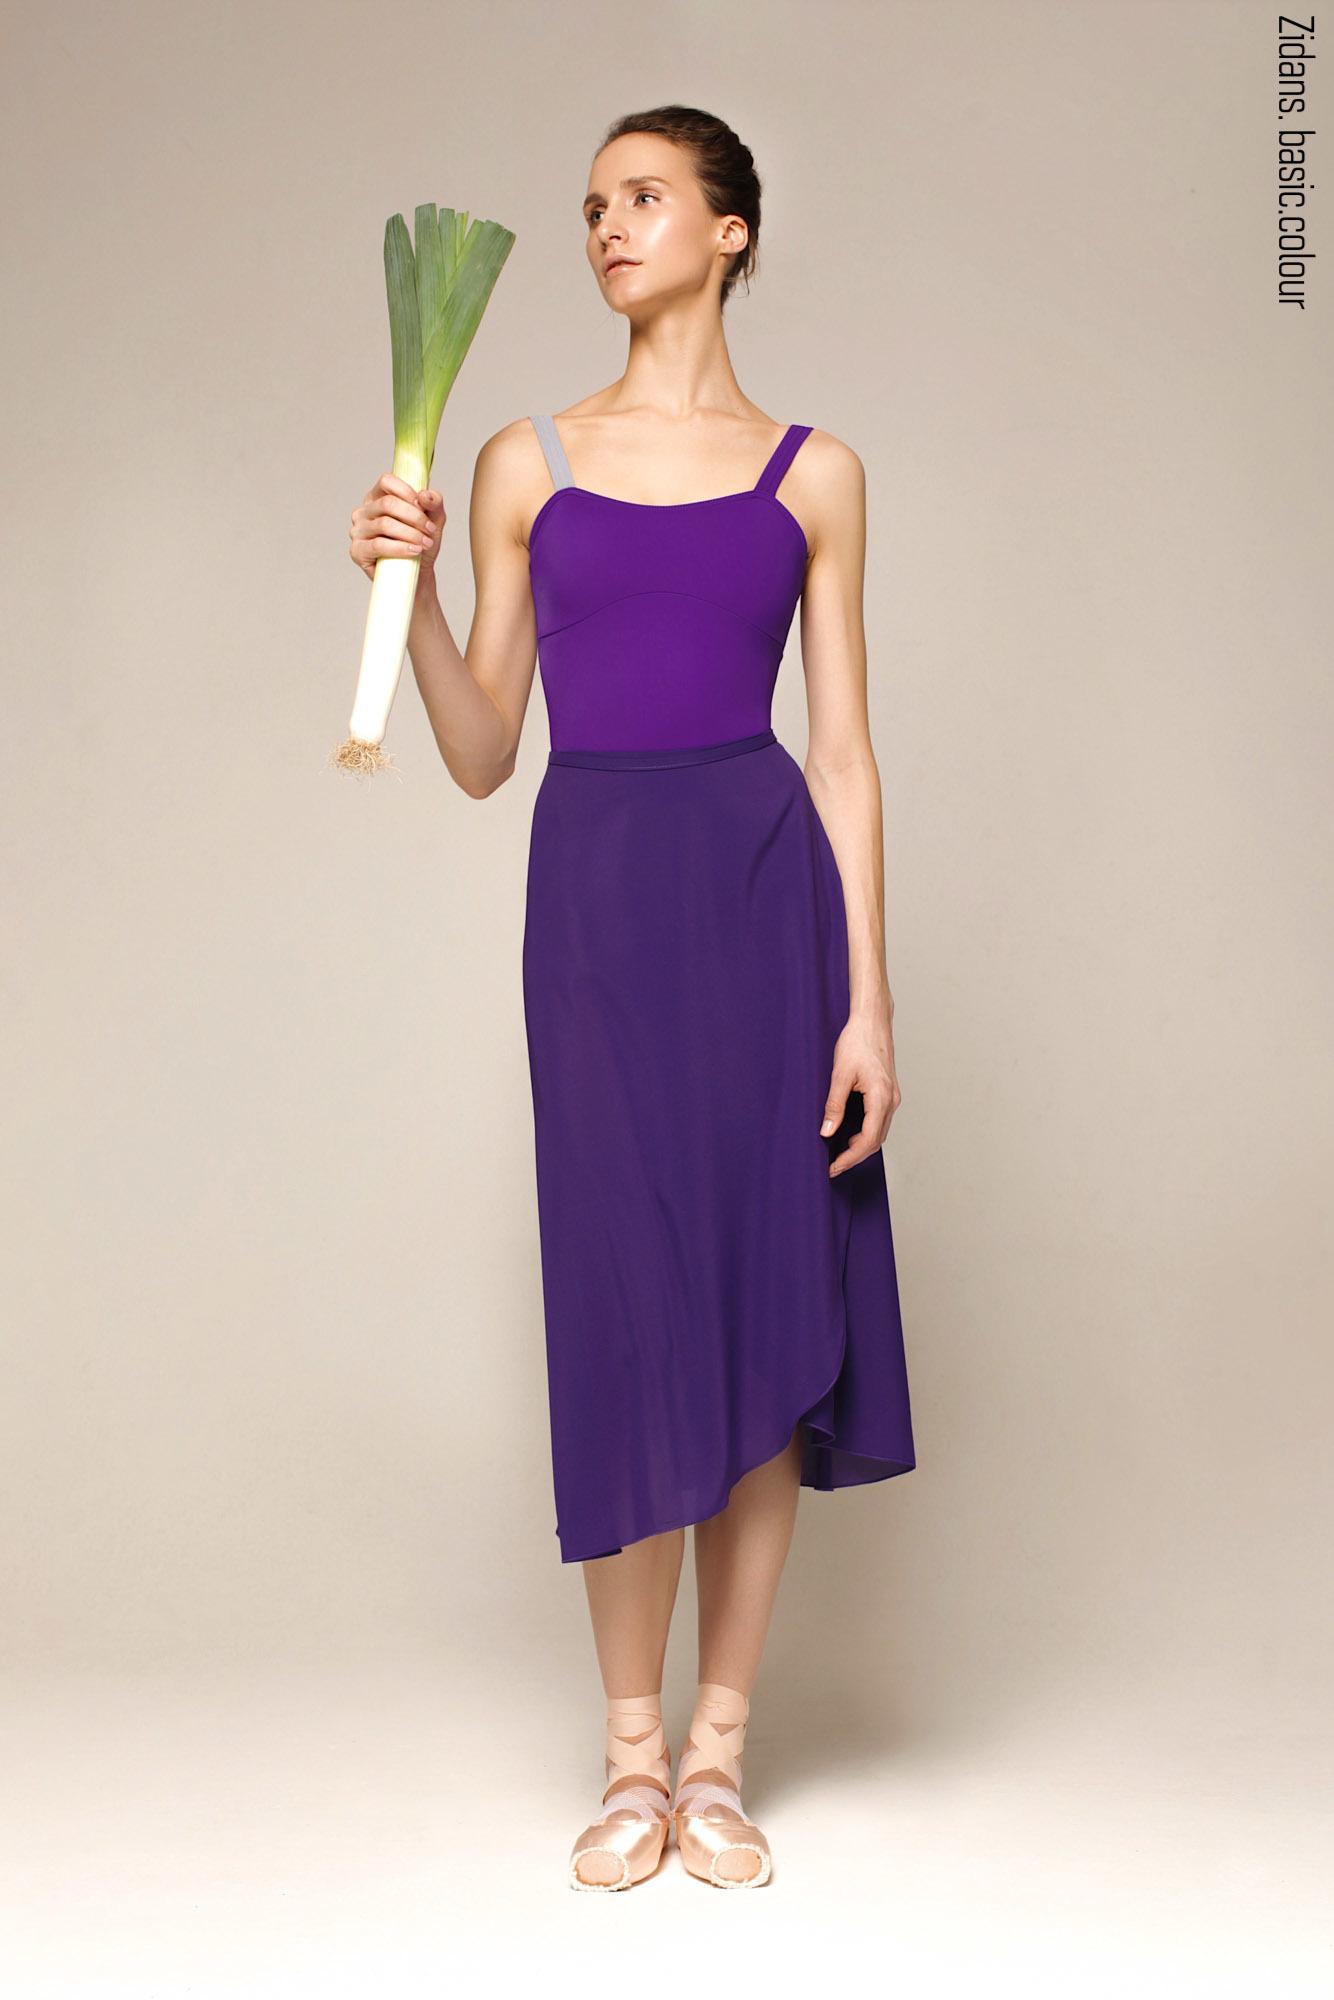 Юбка на запах фиолетовая    4 длины